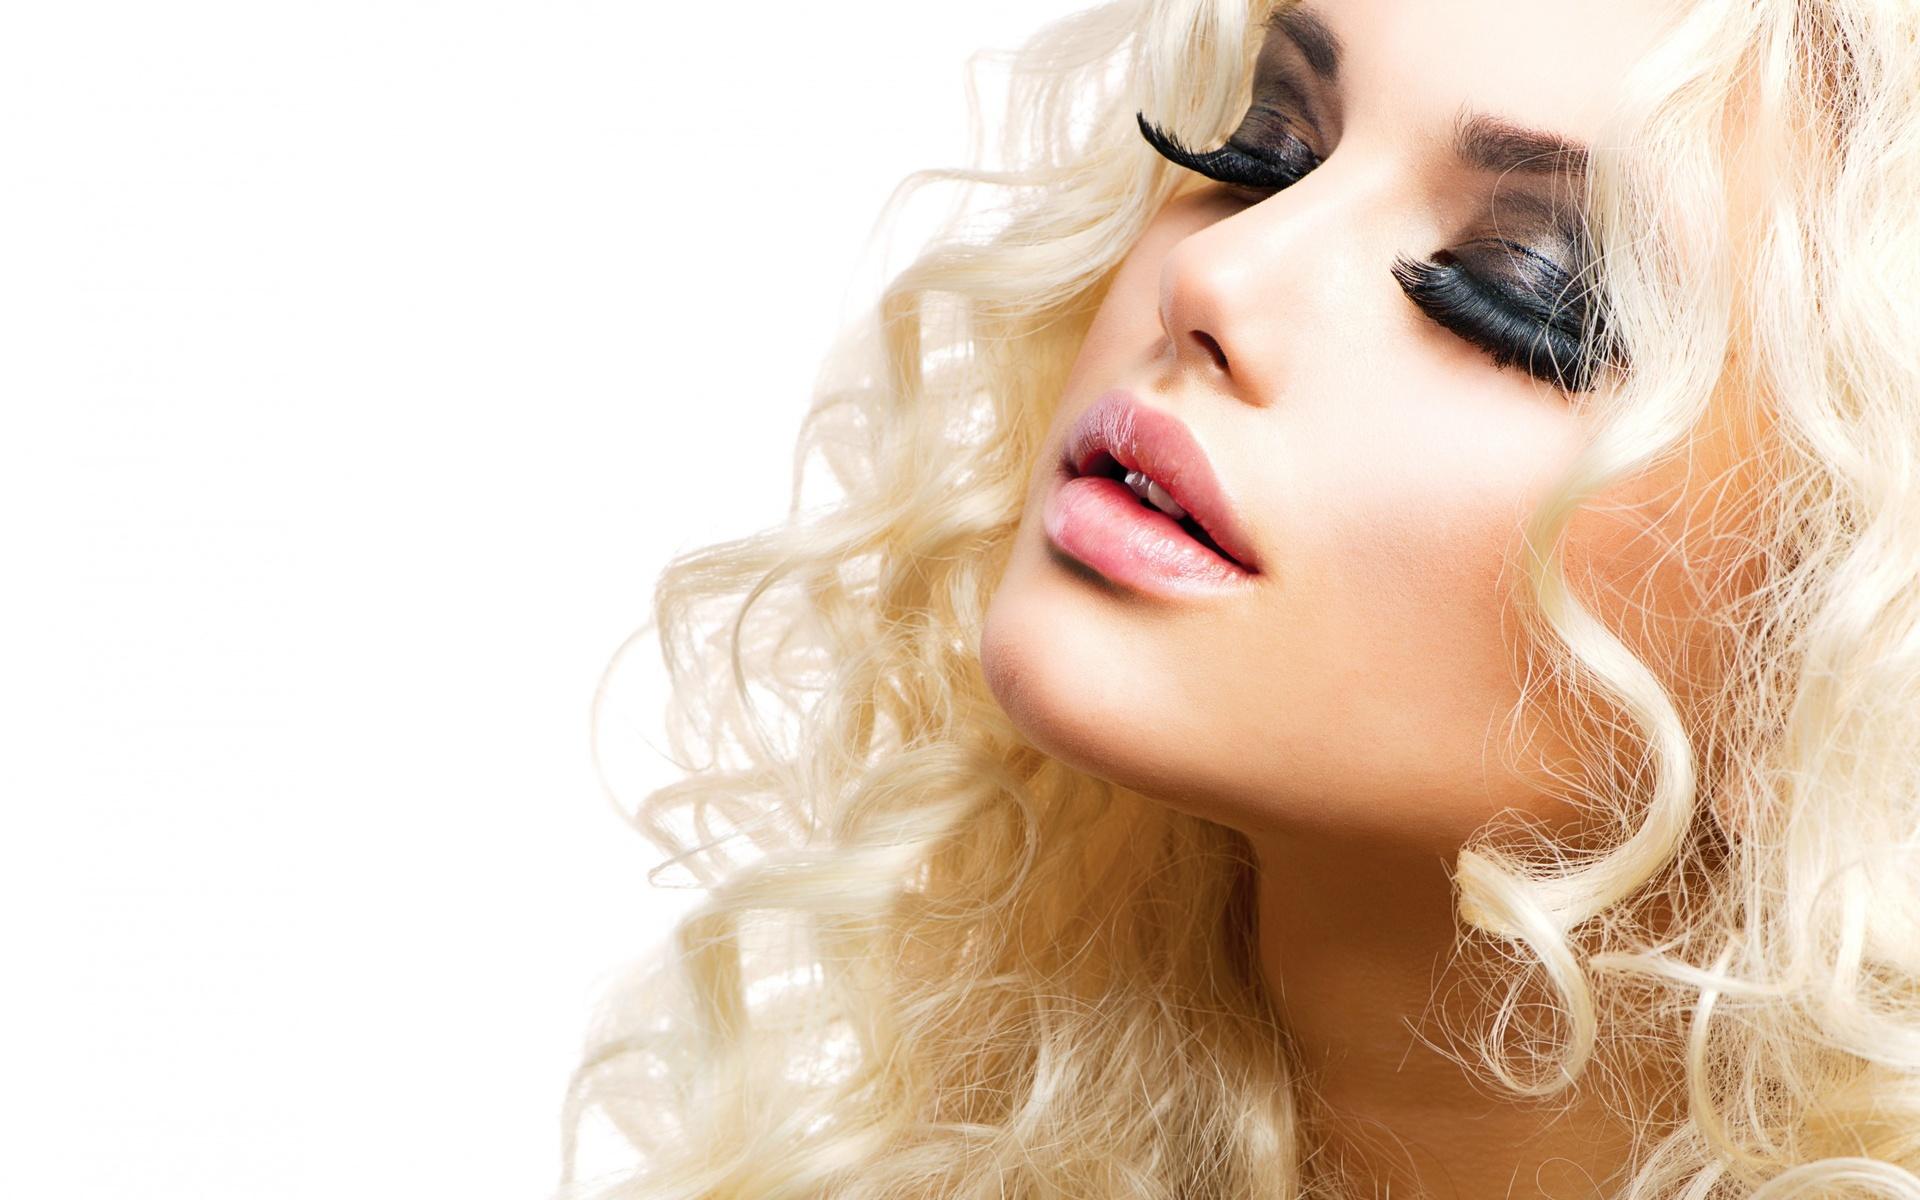 foto-krasivie-devushki-milovidnie-blondinki